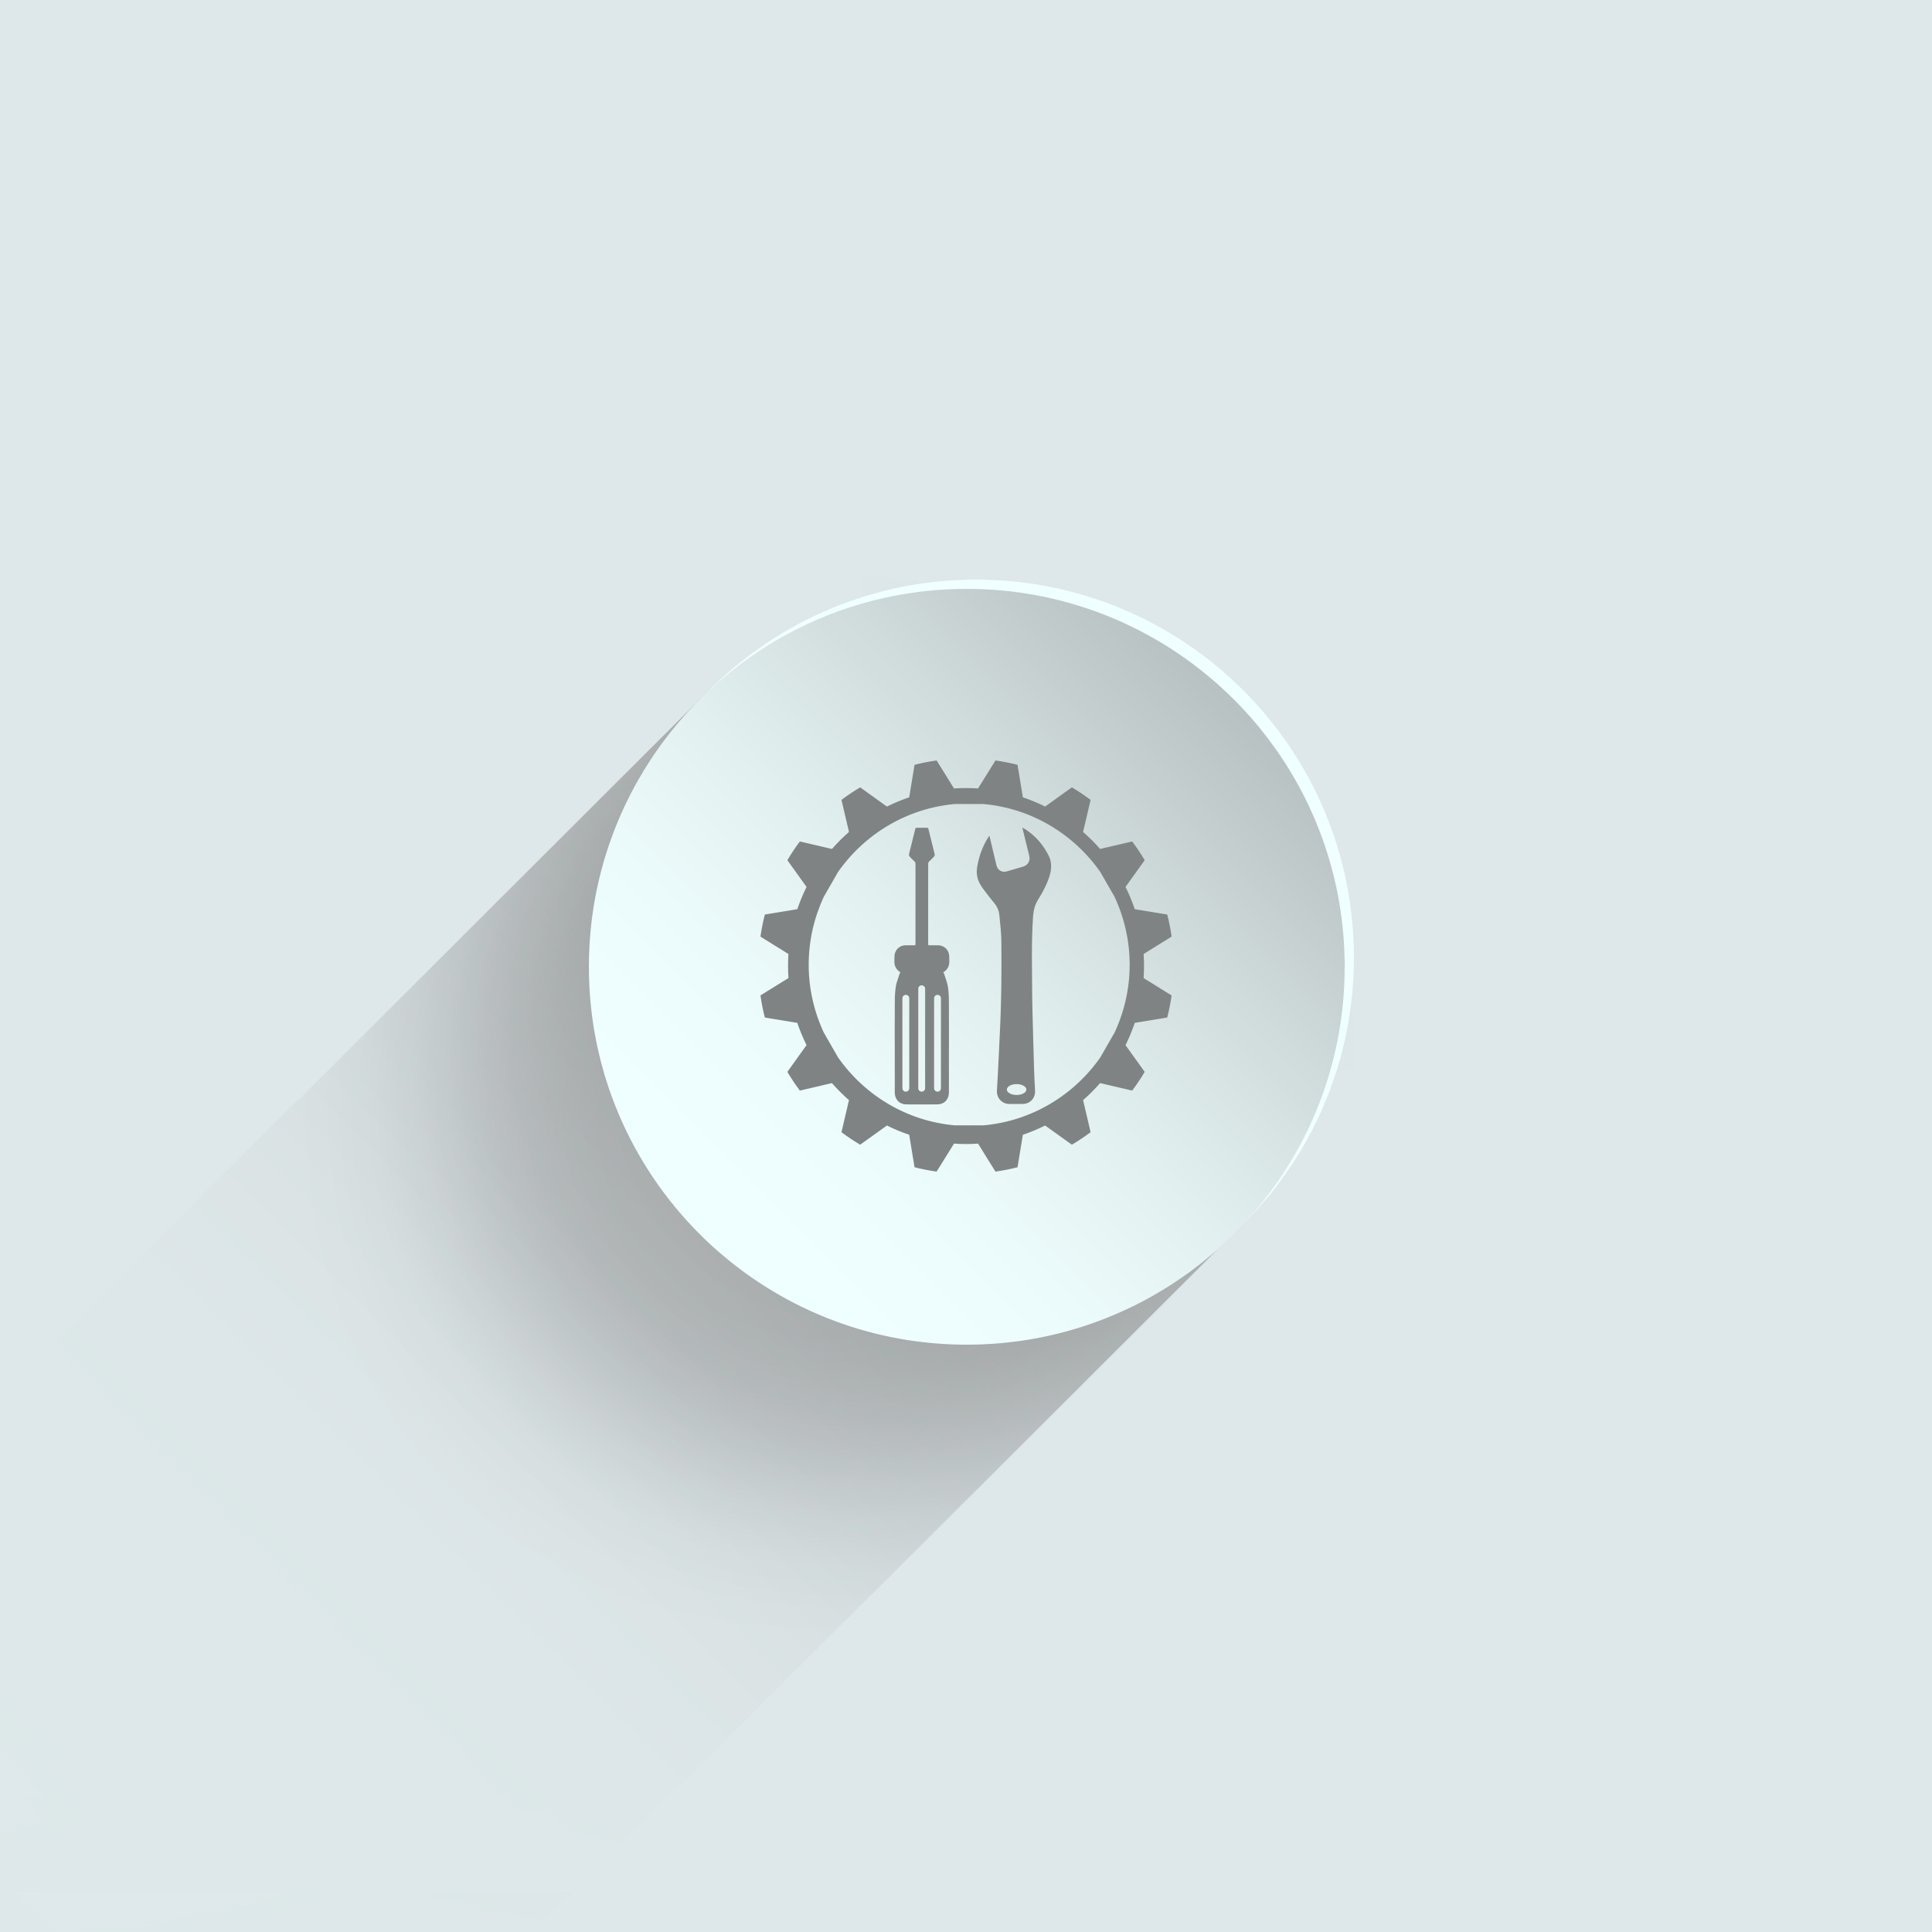 icon-1379276